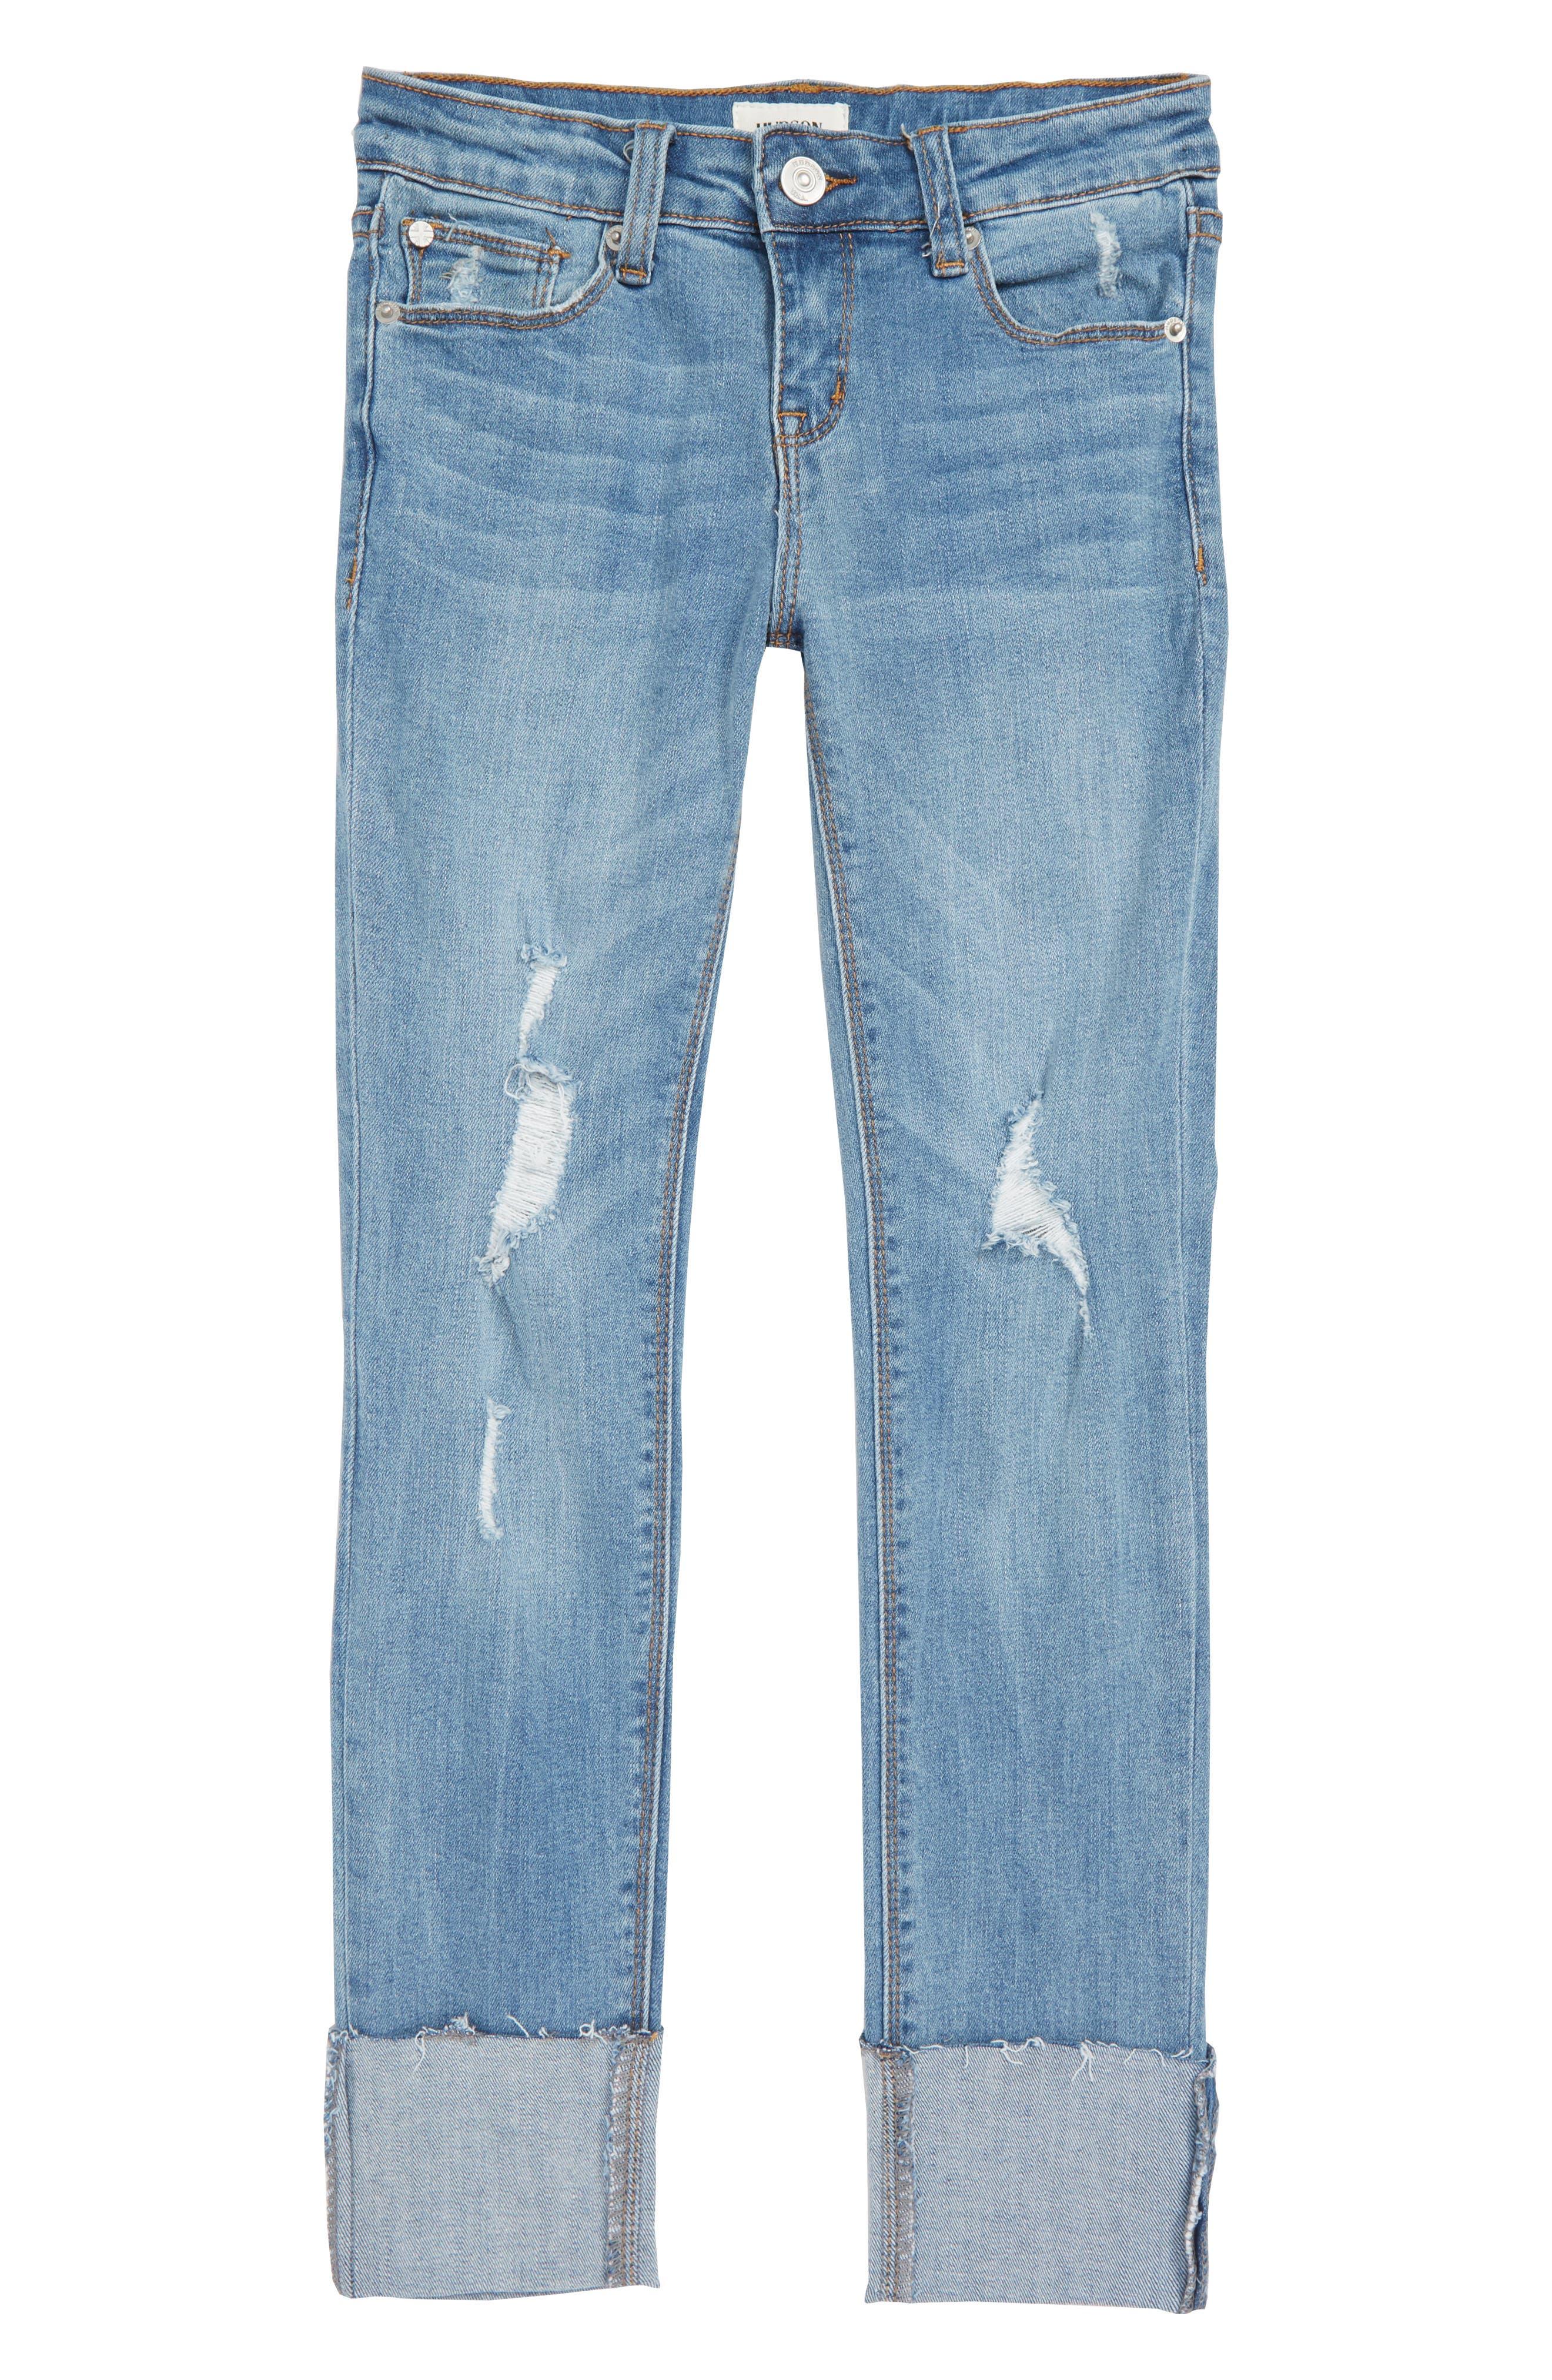 Girls Hudson Kids Kaia Convertible Skinny Jeans Size 14  Blue